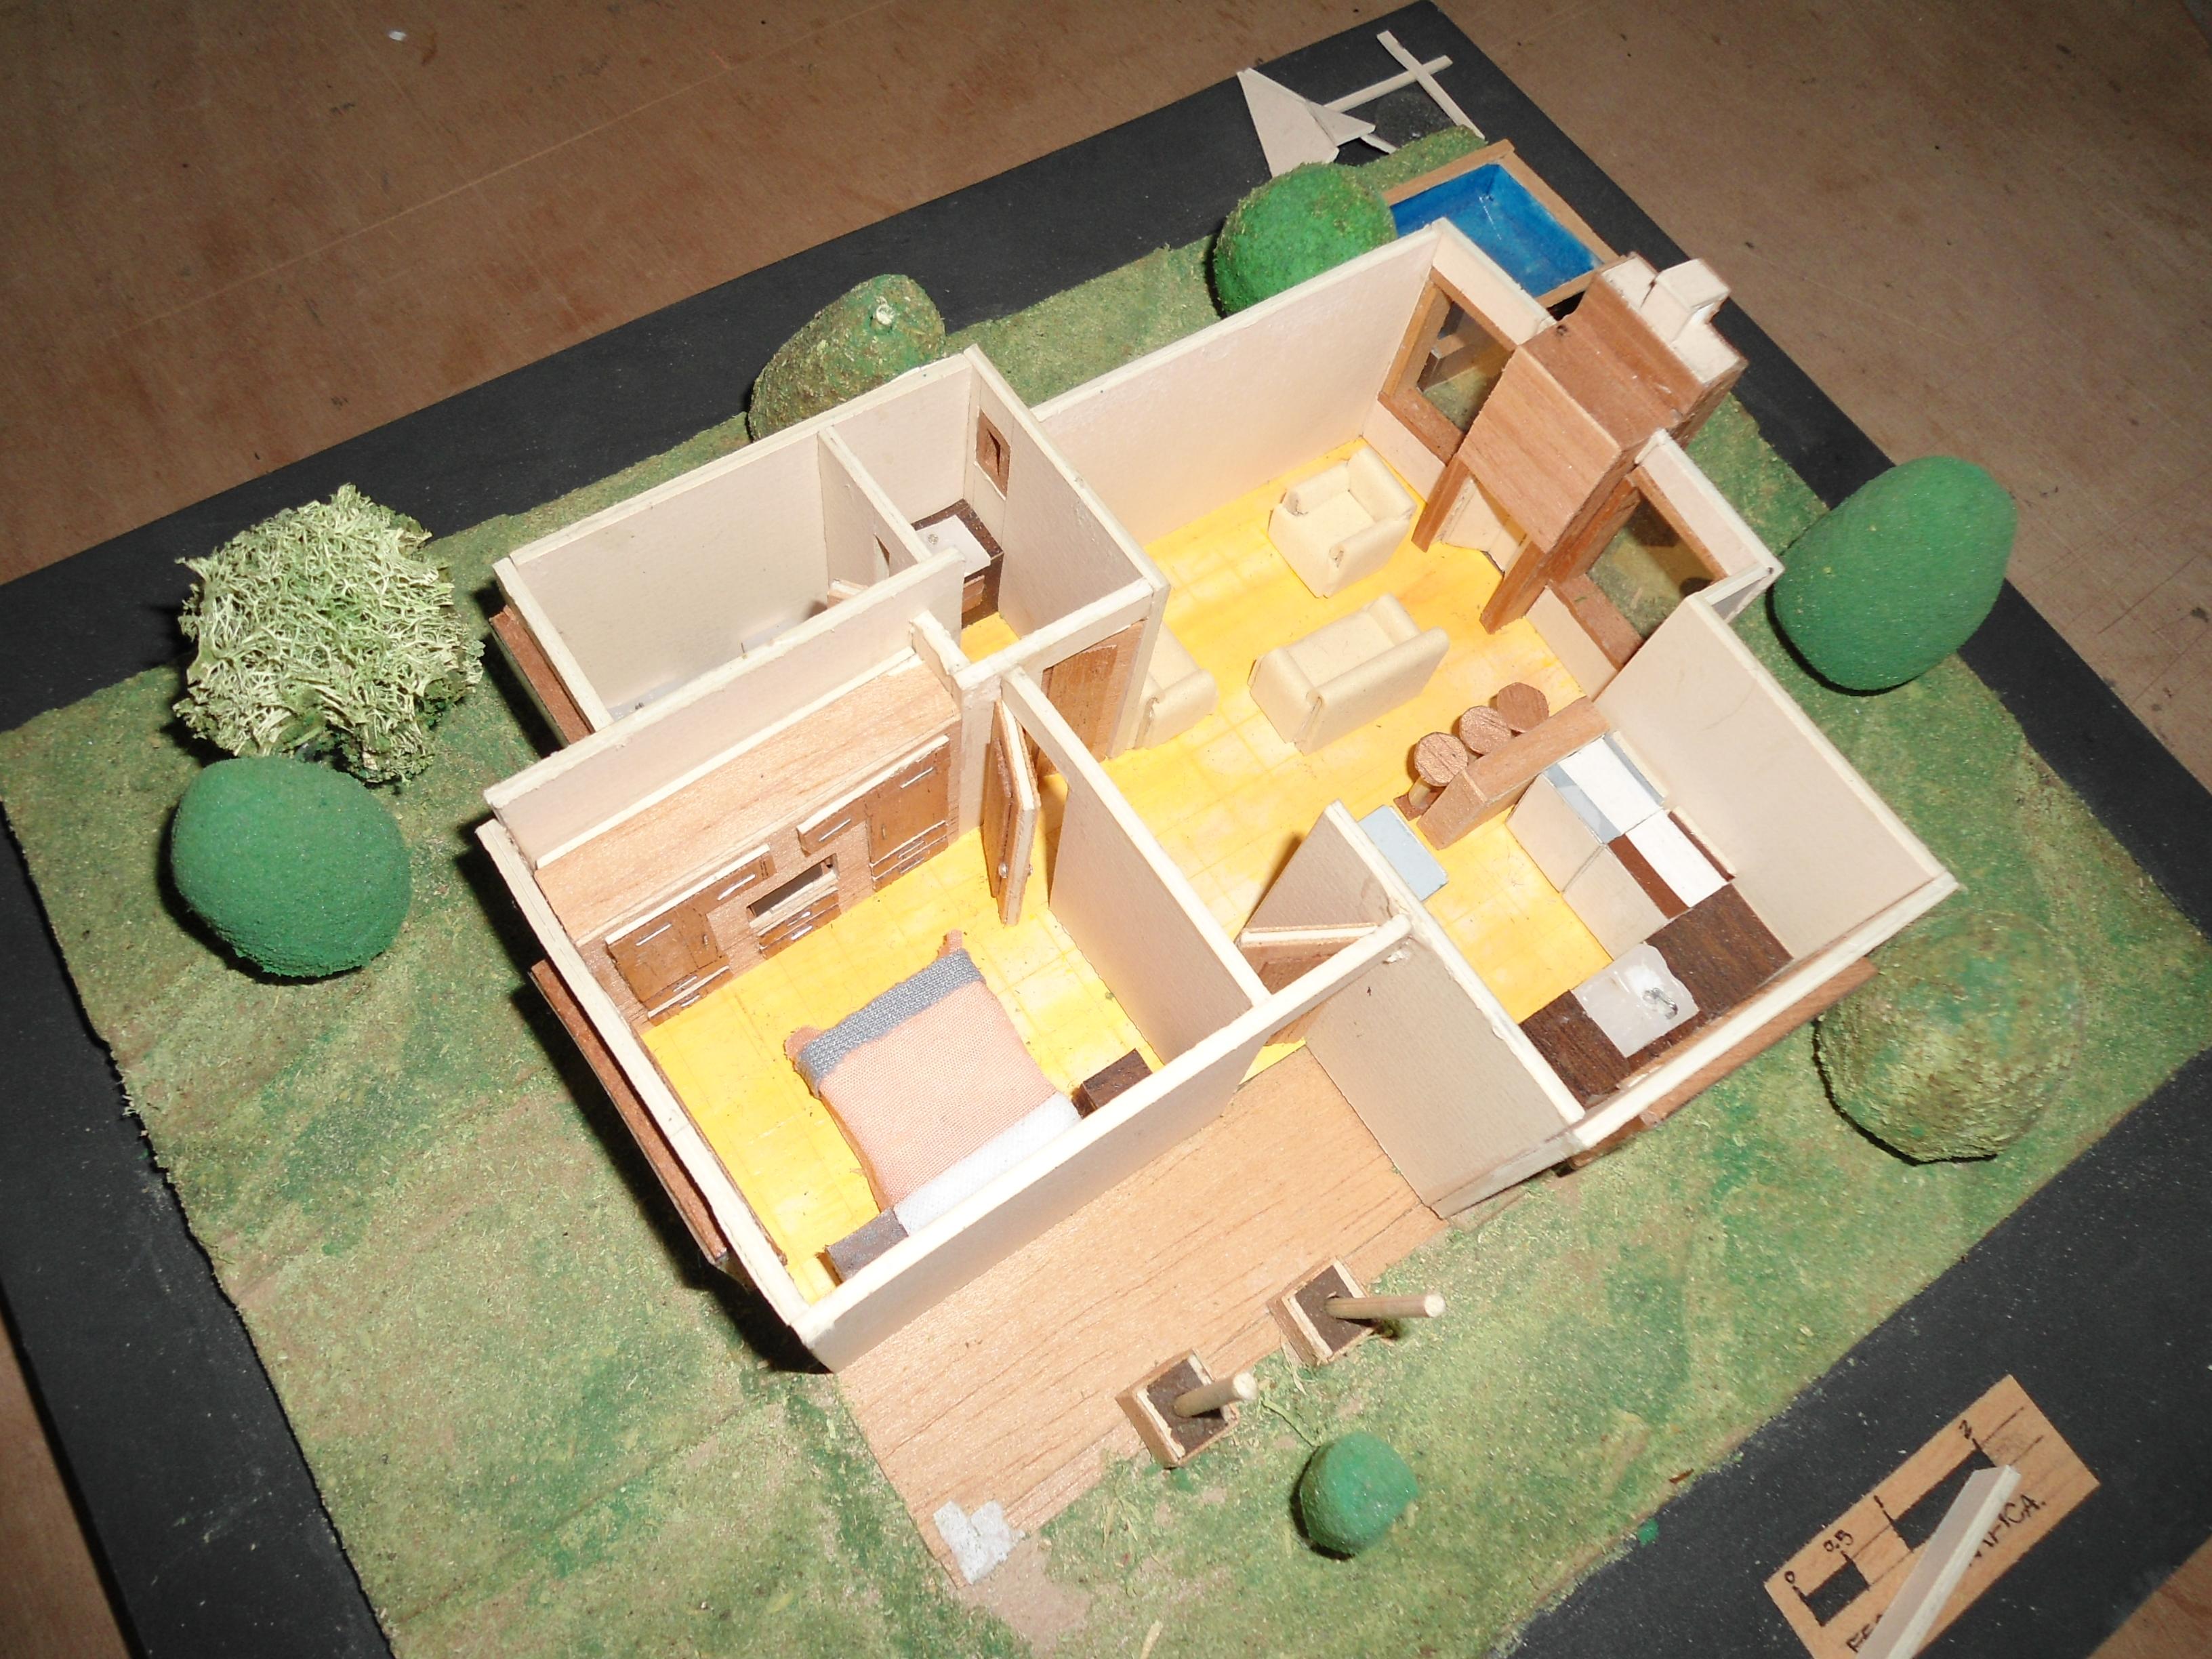 Maqueta Final de Modelos Arquitectònicos 1 | Arq. Talento